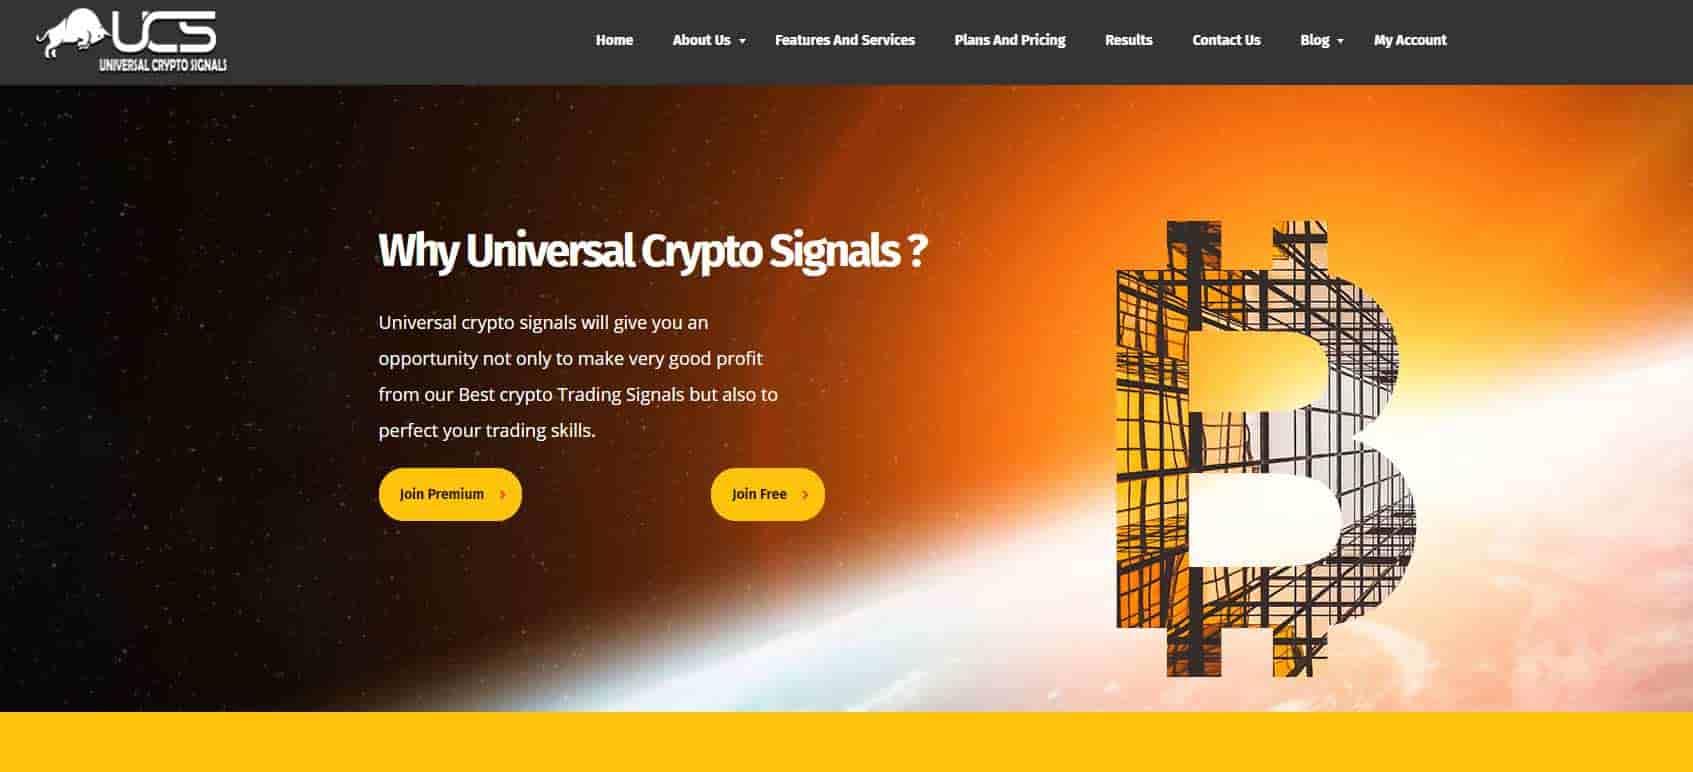 universal crypto signals